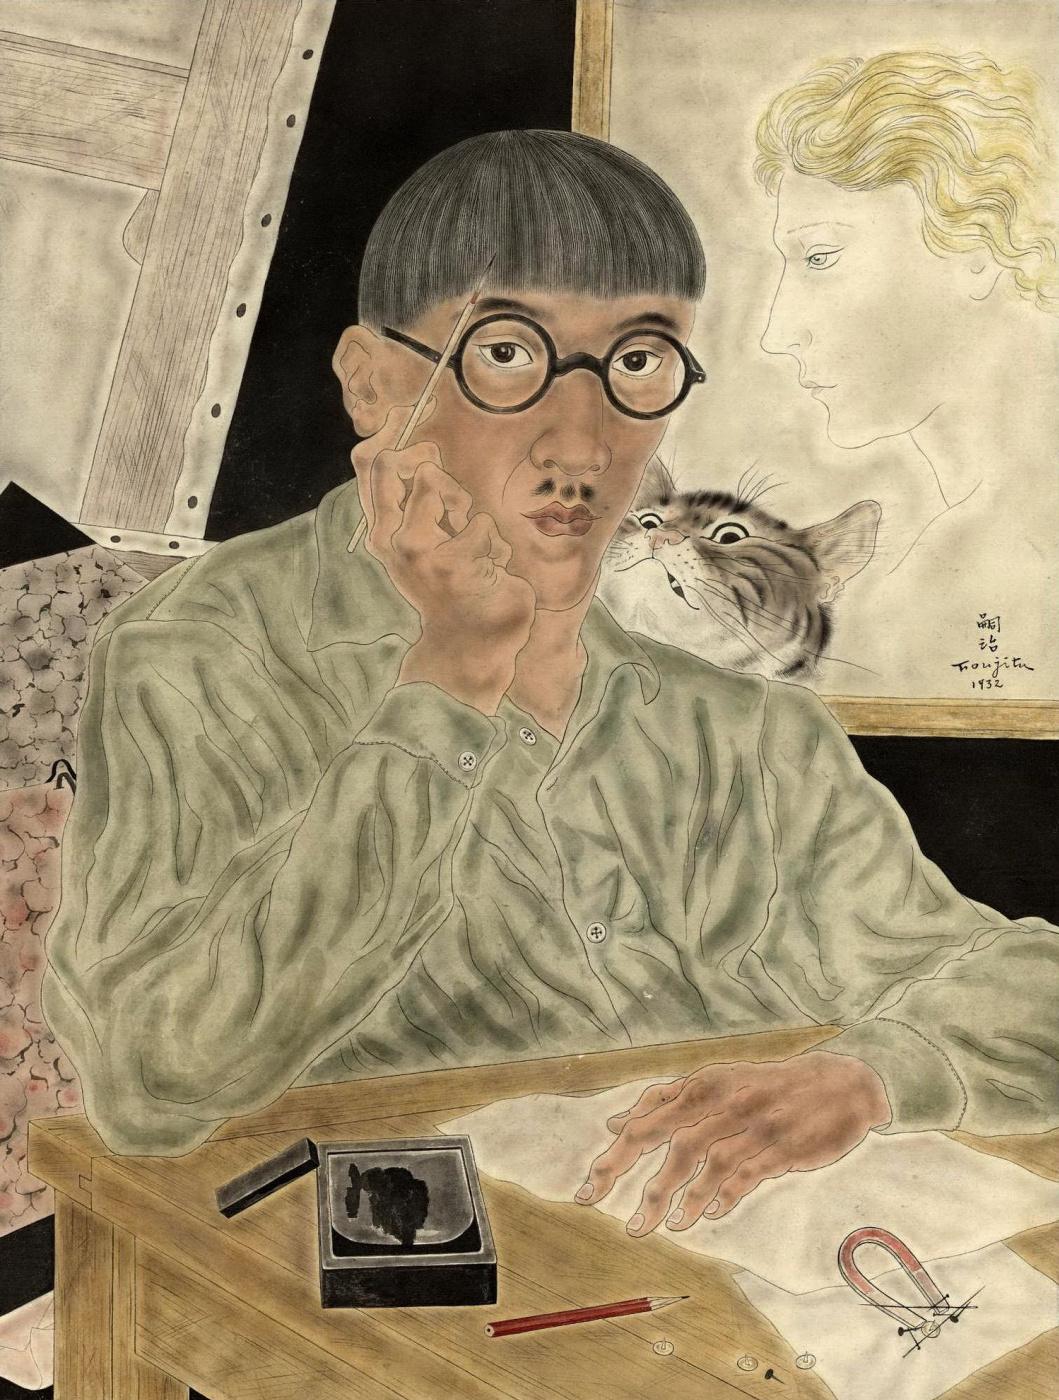 Zuguharu Fujita (Léonard Fujita). Self-portrait